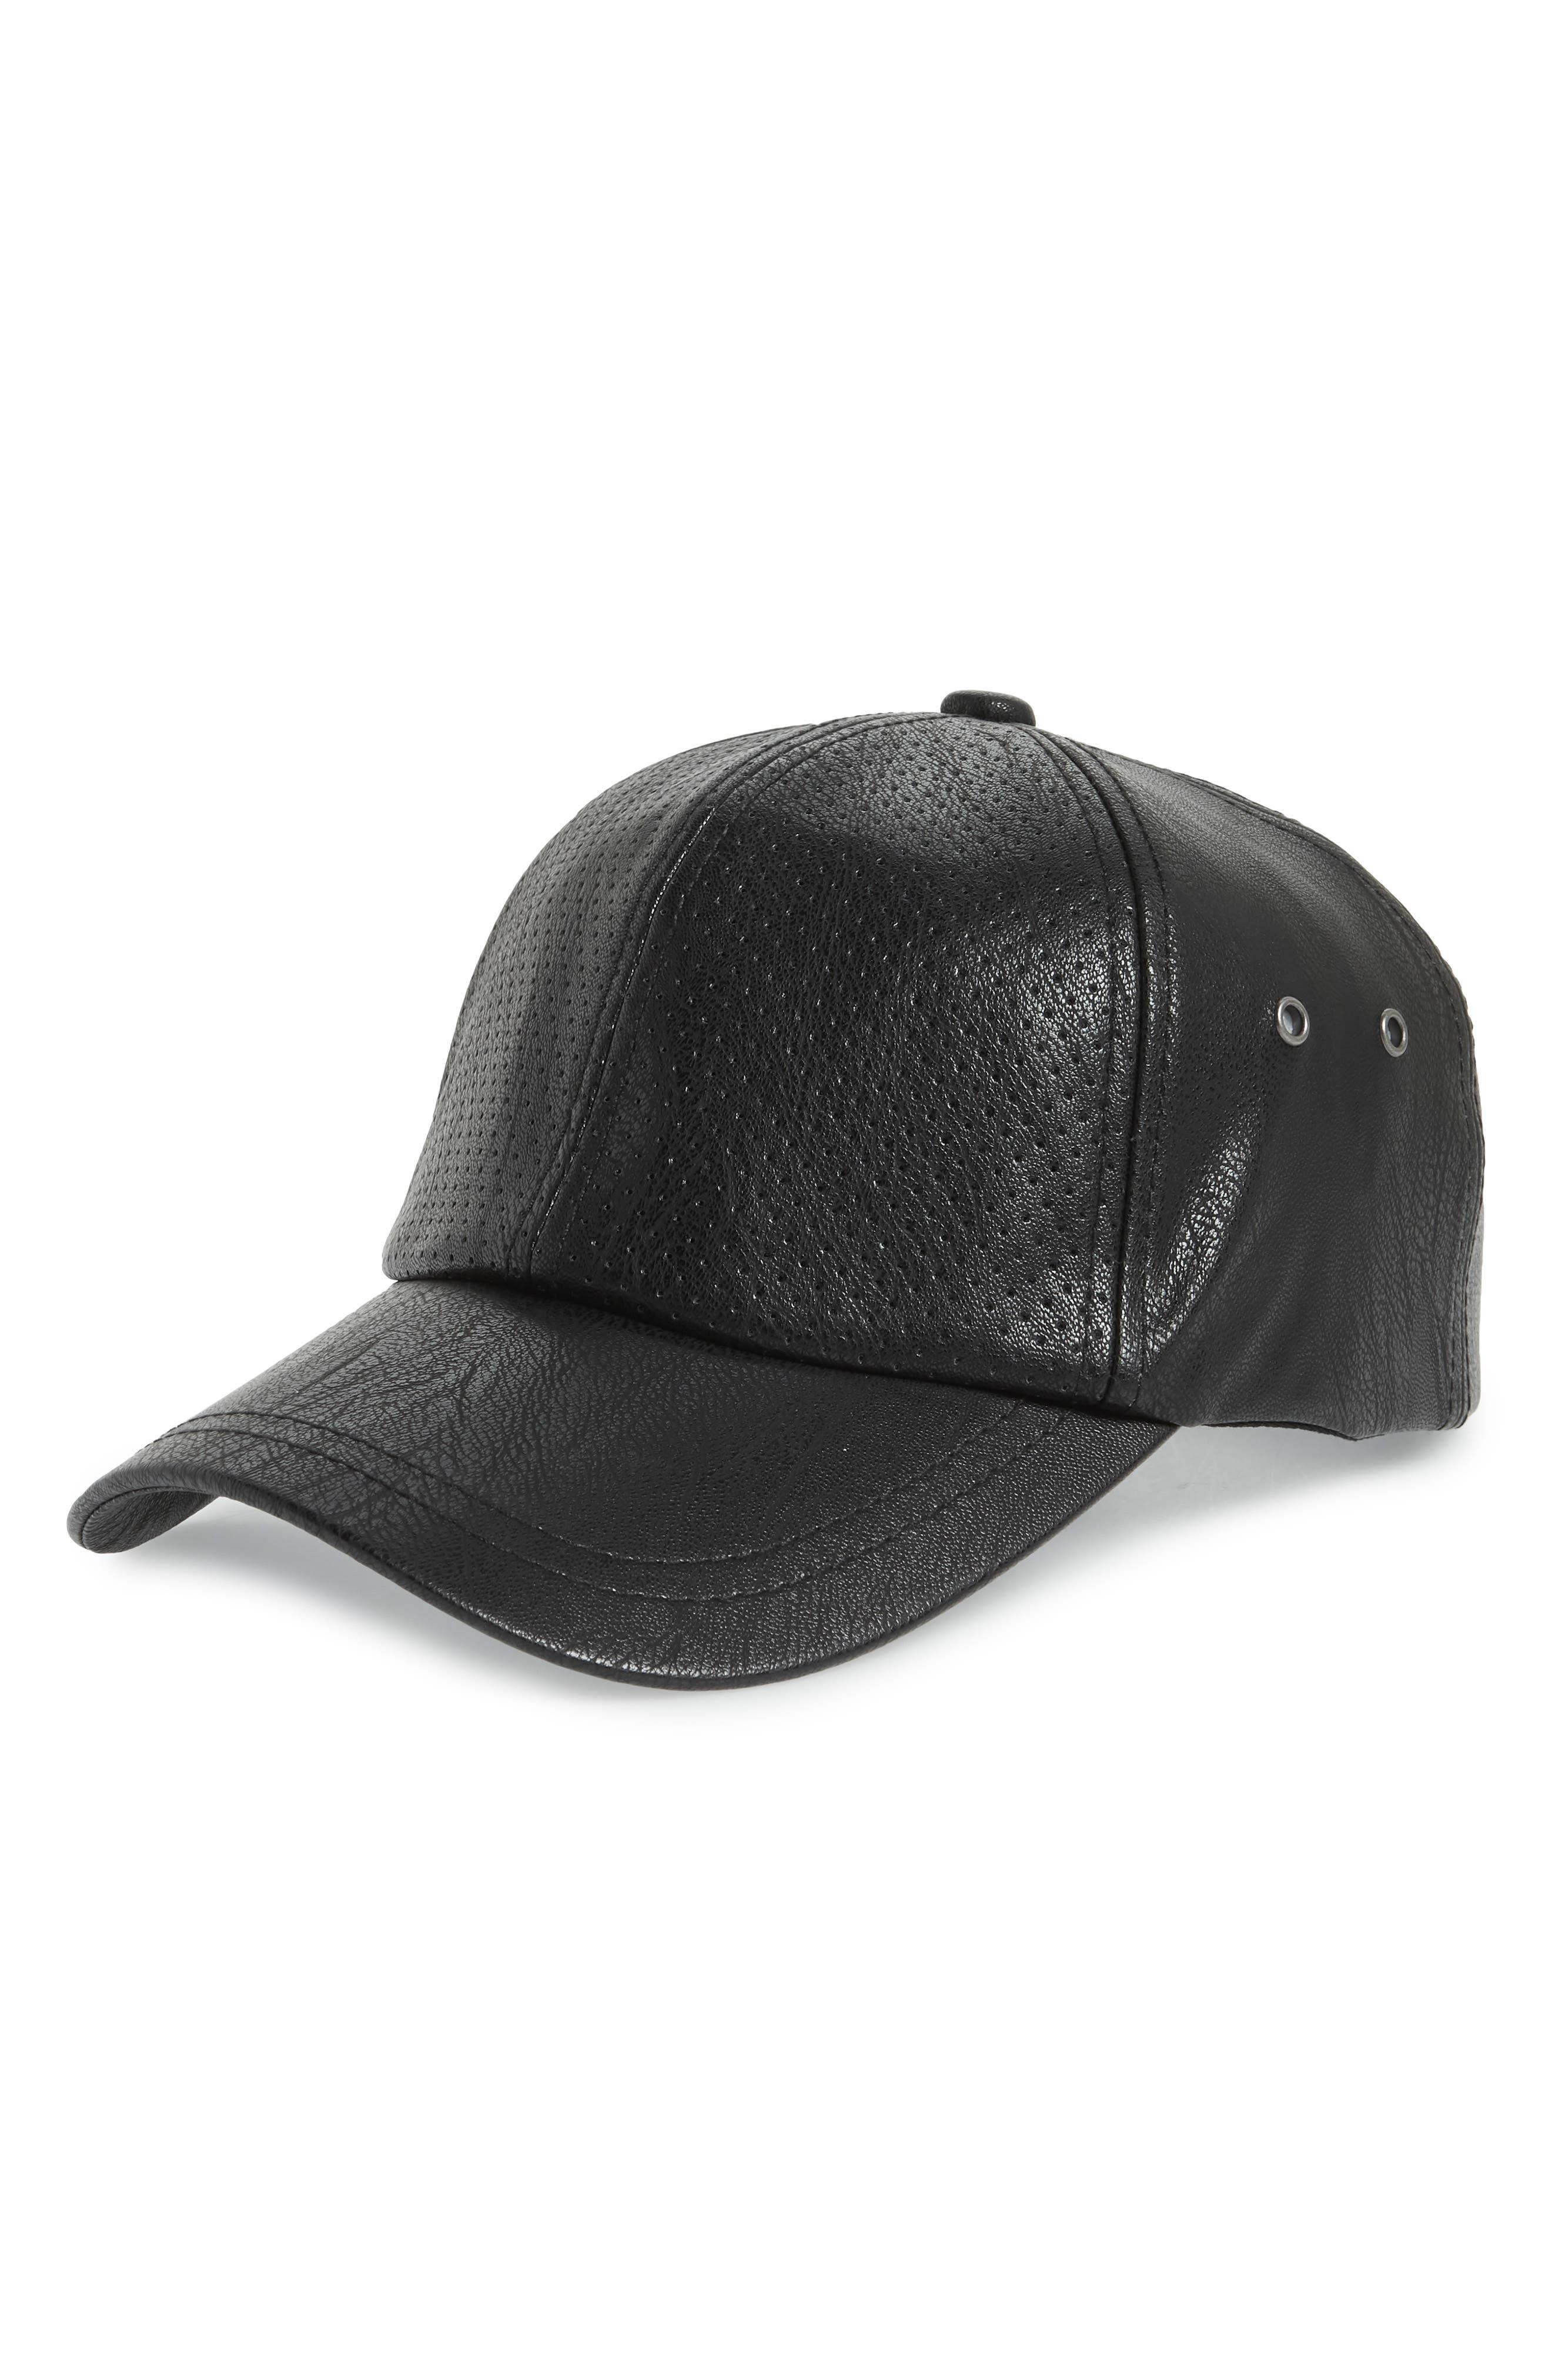 SWEAT ACTIVE Faux Leather Baseball Cap, Main, color, 001